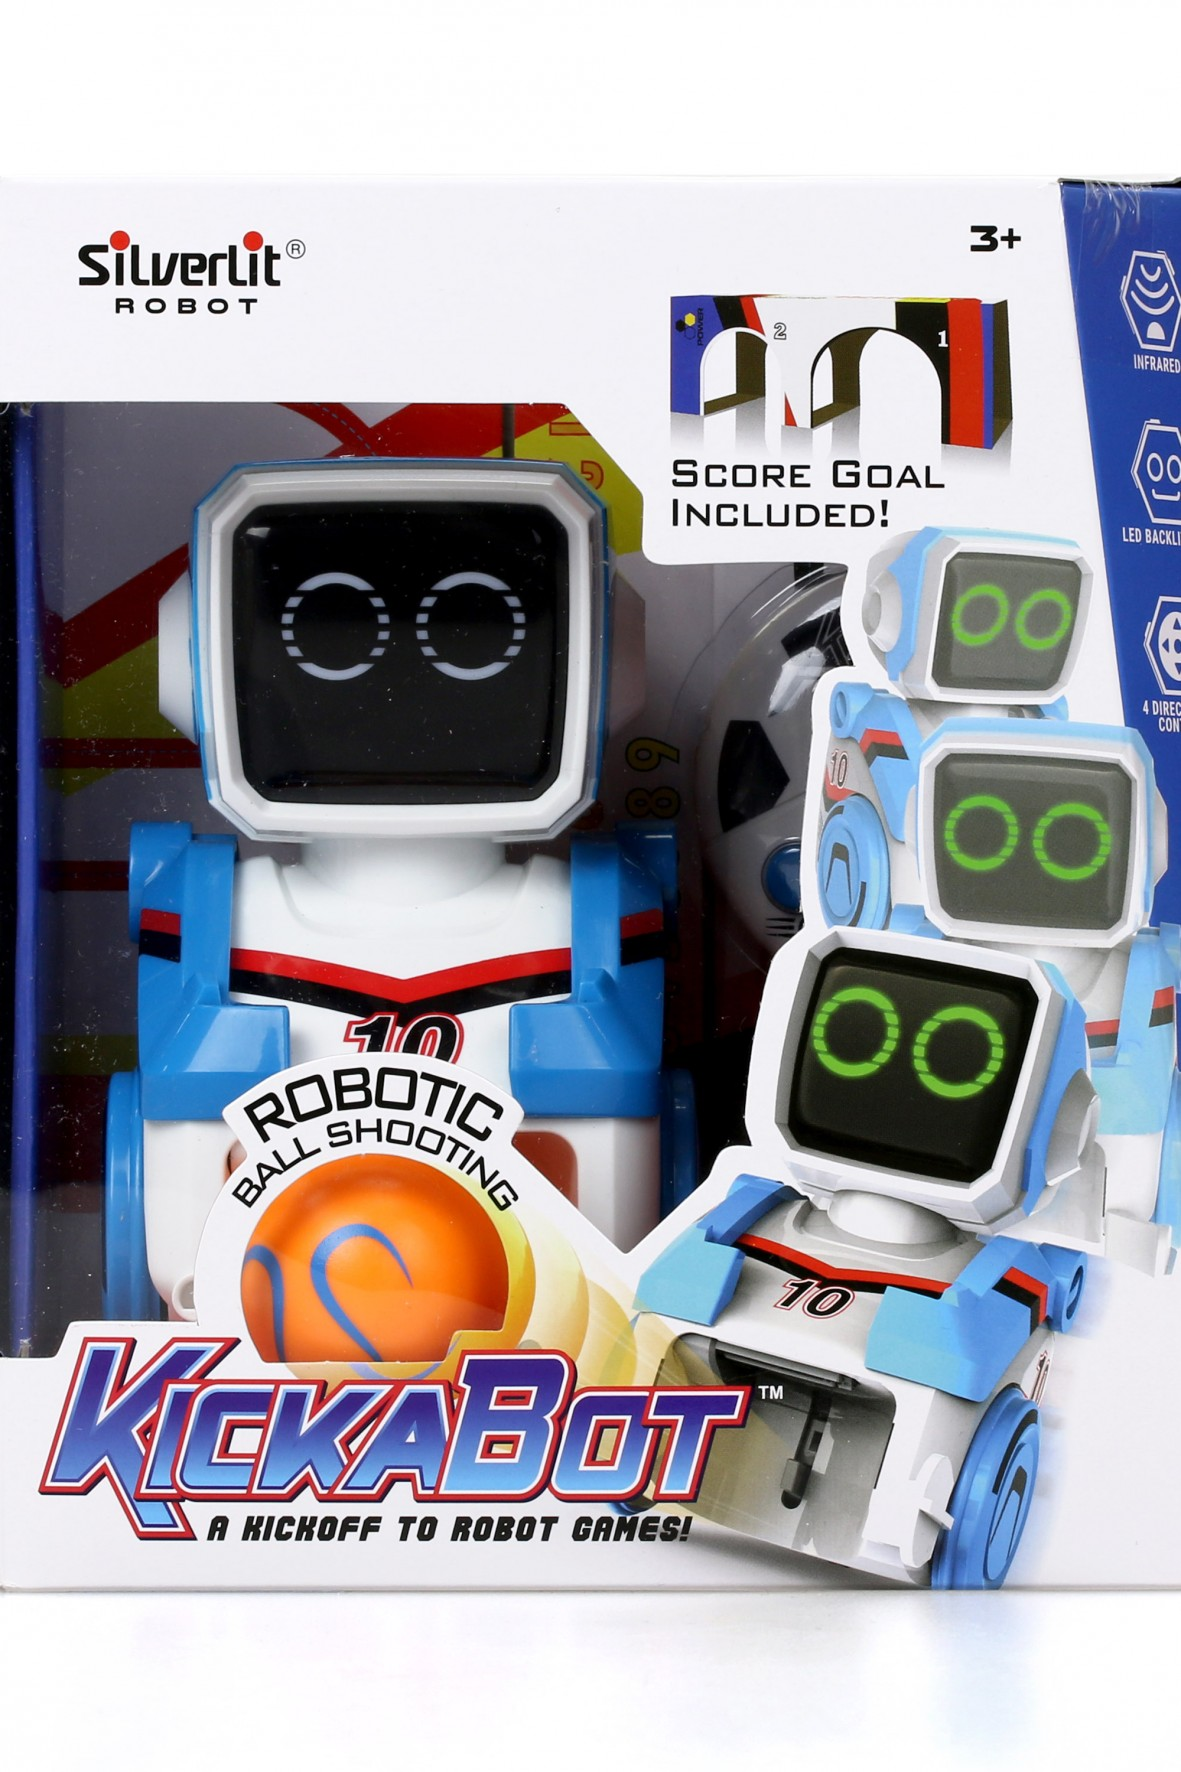 Kickabot